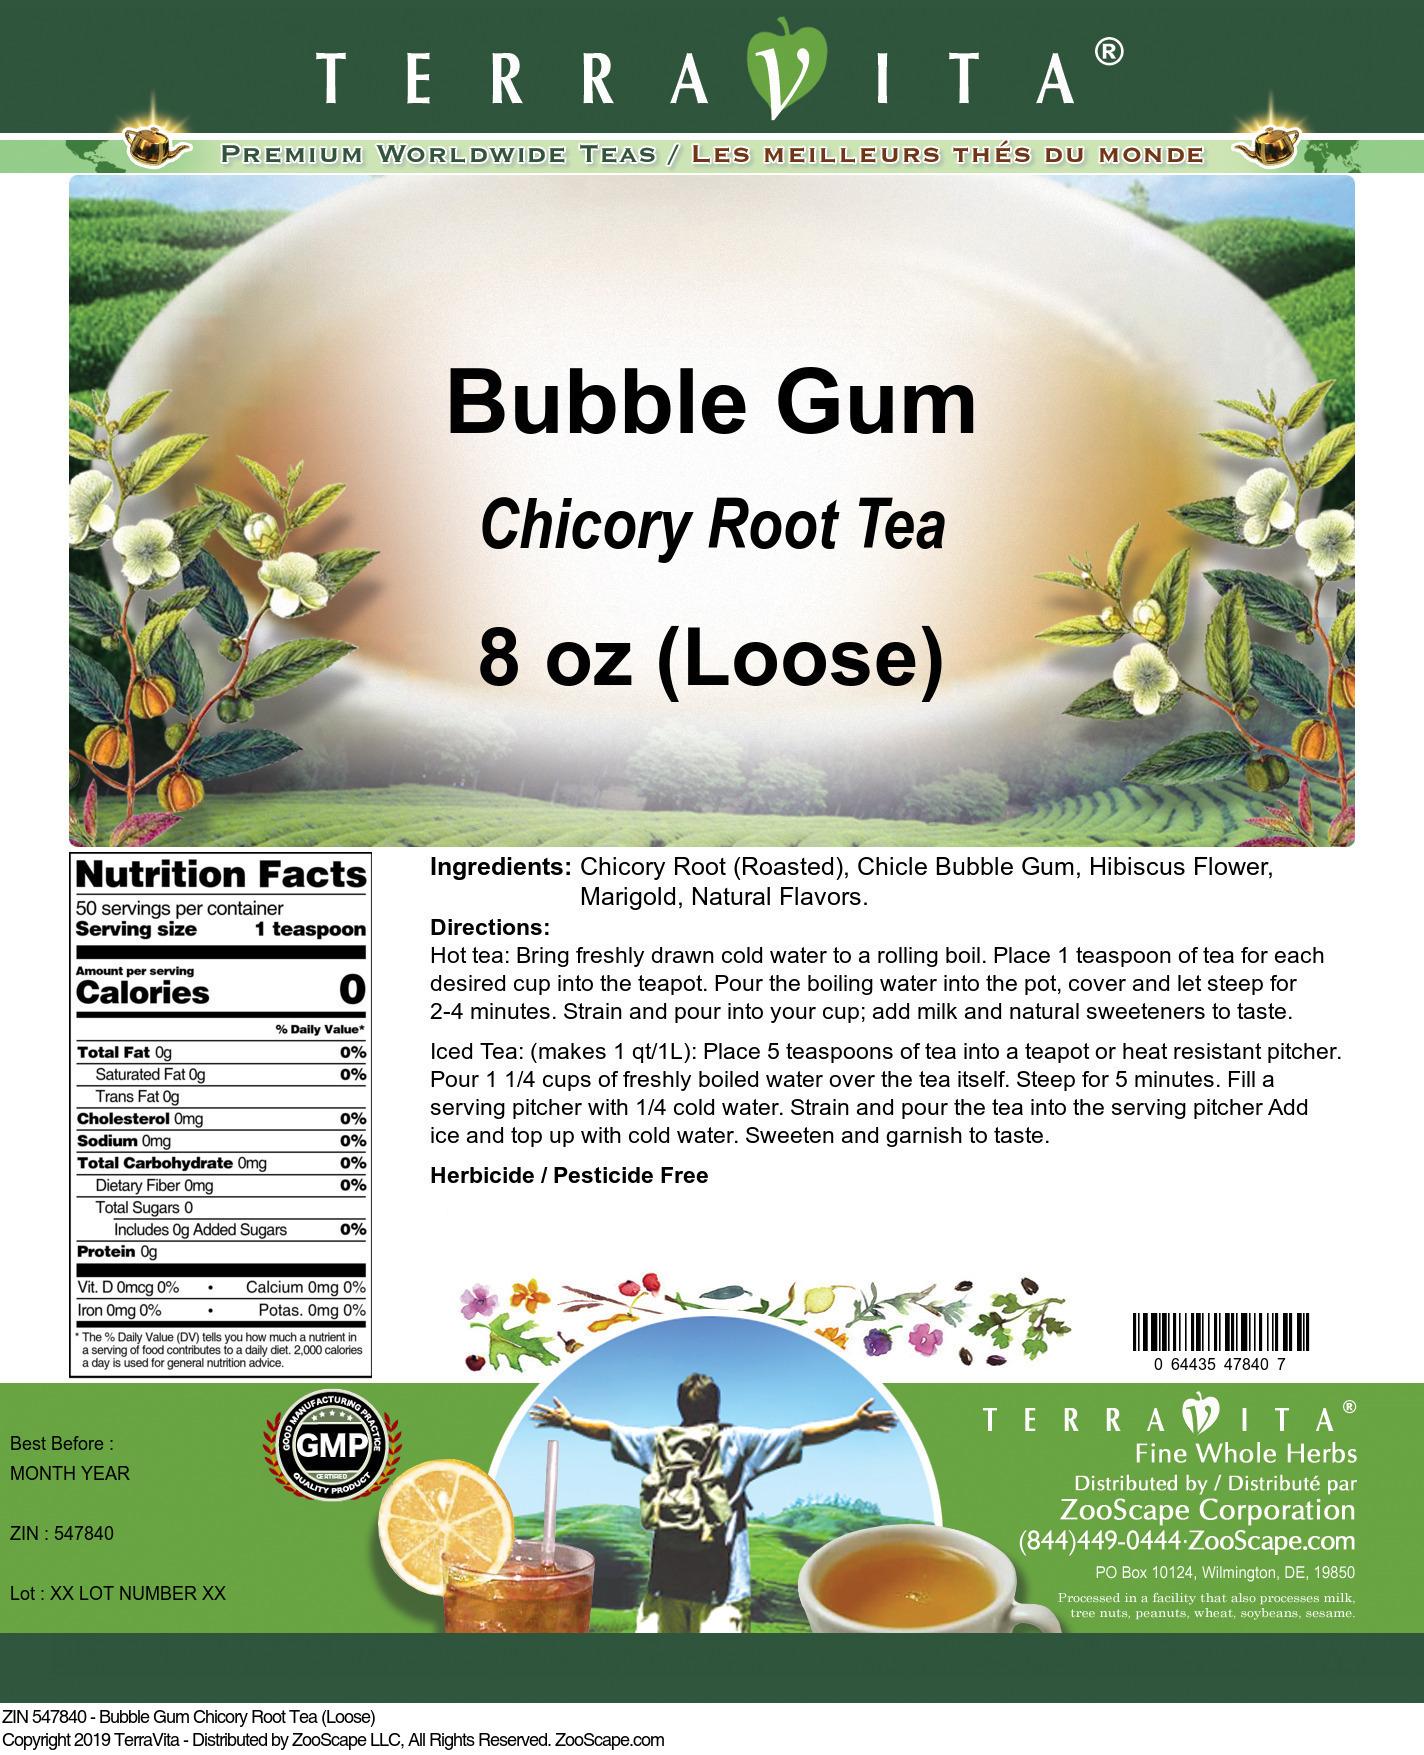 Bubble Gum Chicory Root Tea (Loose)